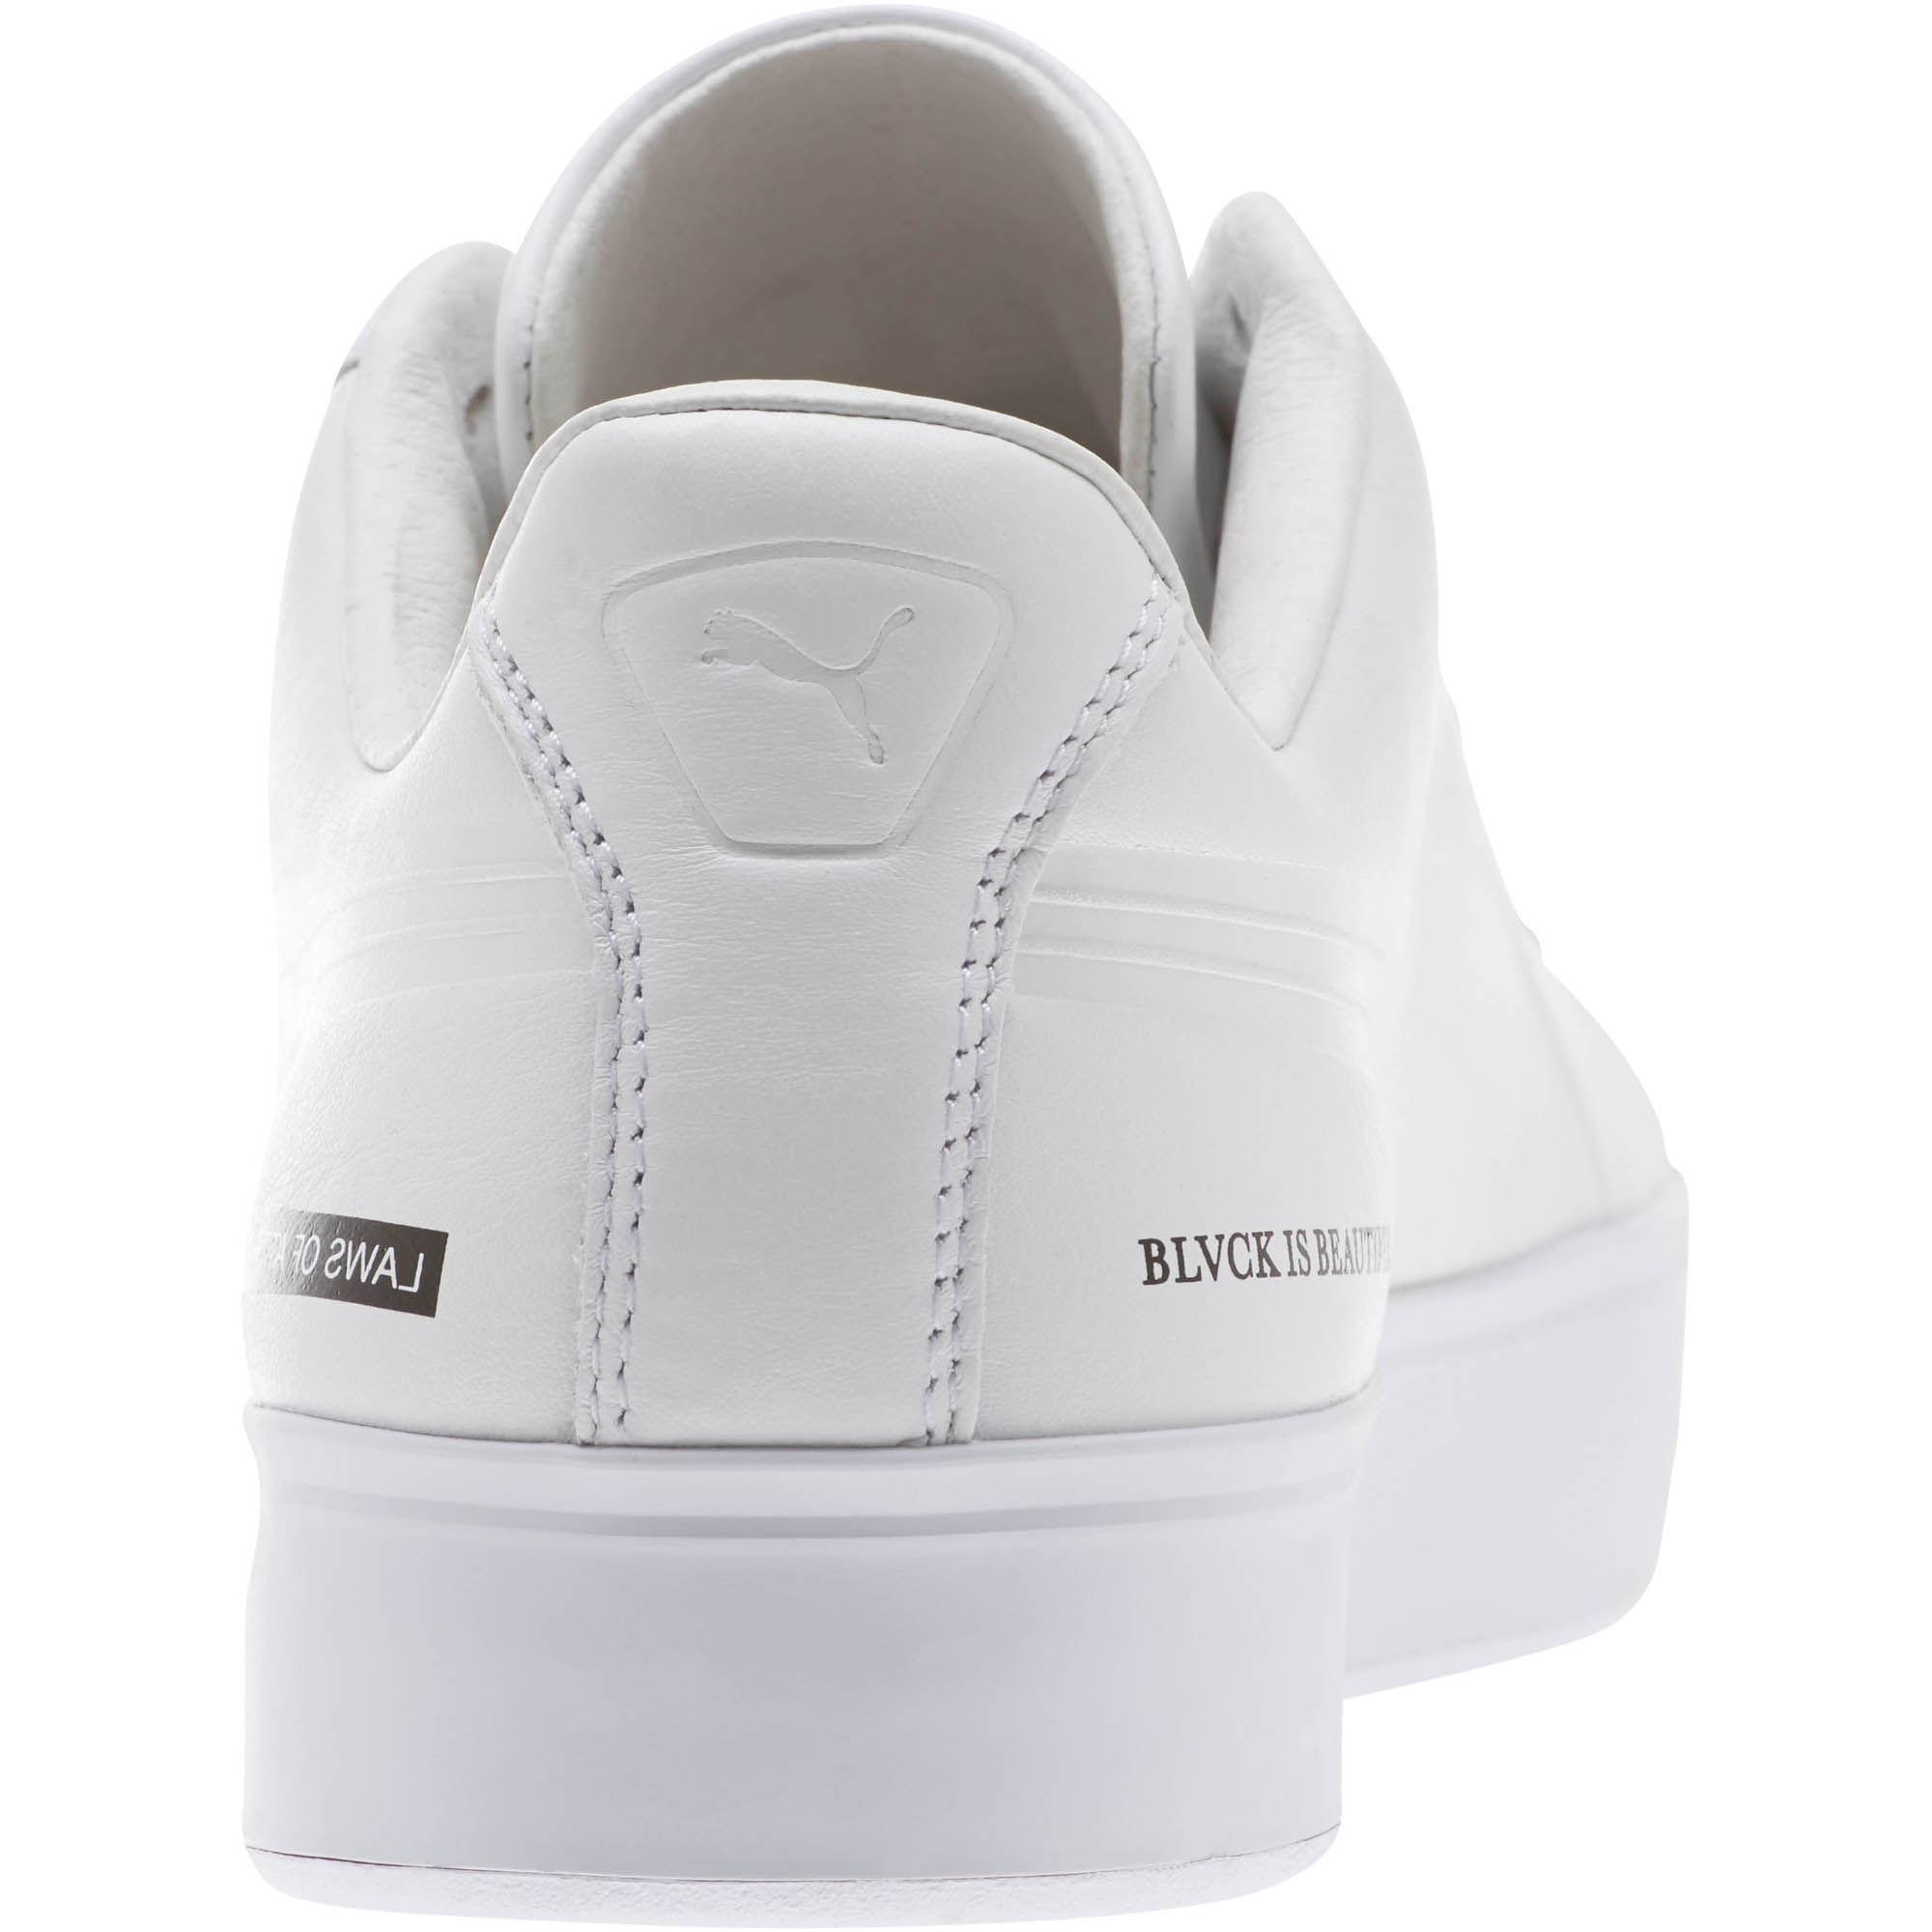 8e3f86467aec8d Lyst - PUMA X Black Scale Court Platform Men s Sneakers in White for Men